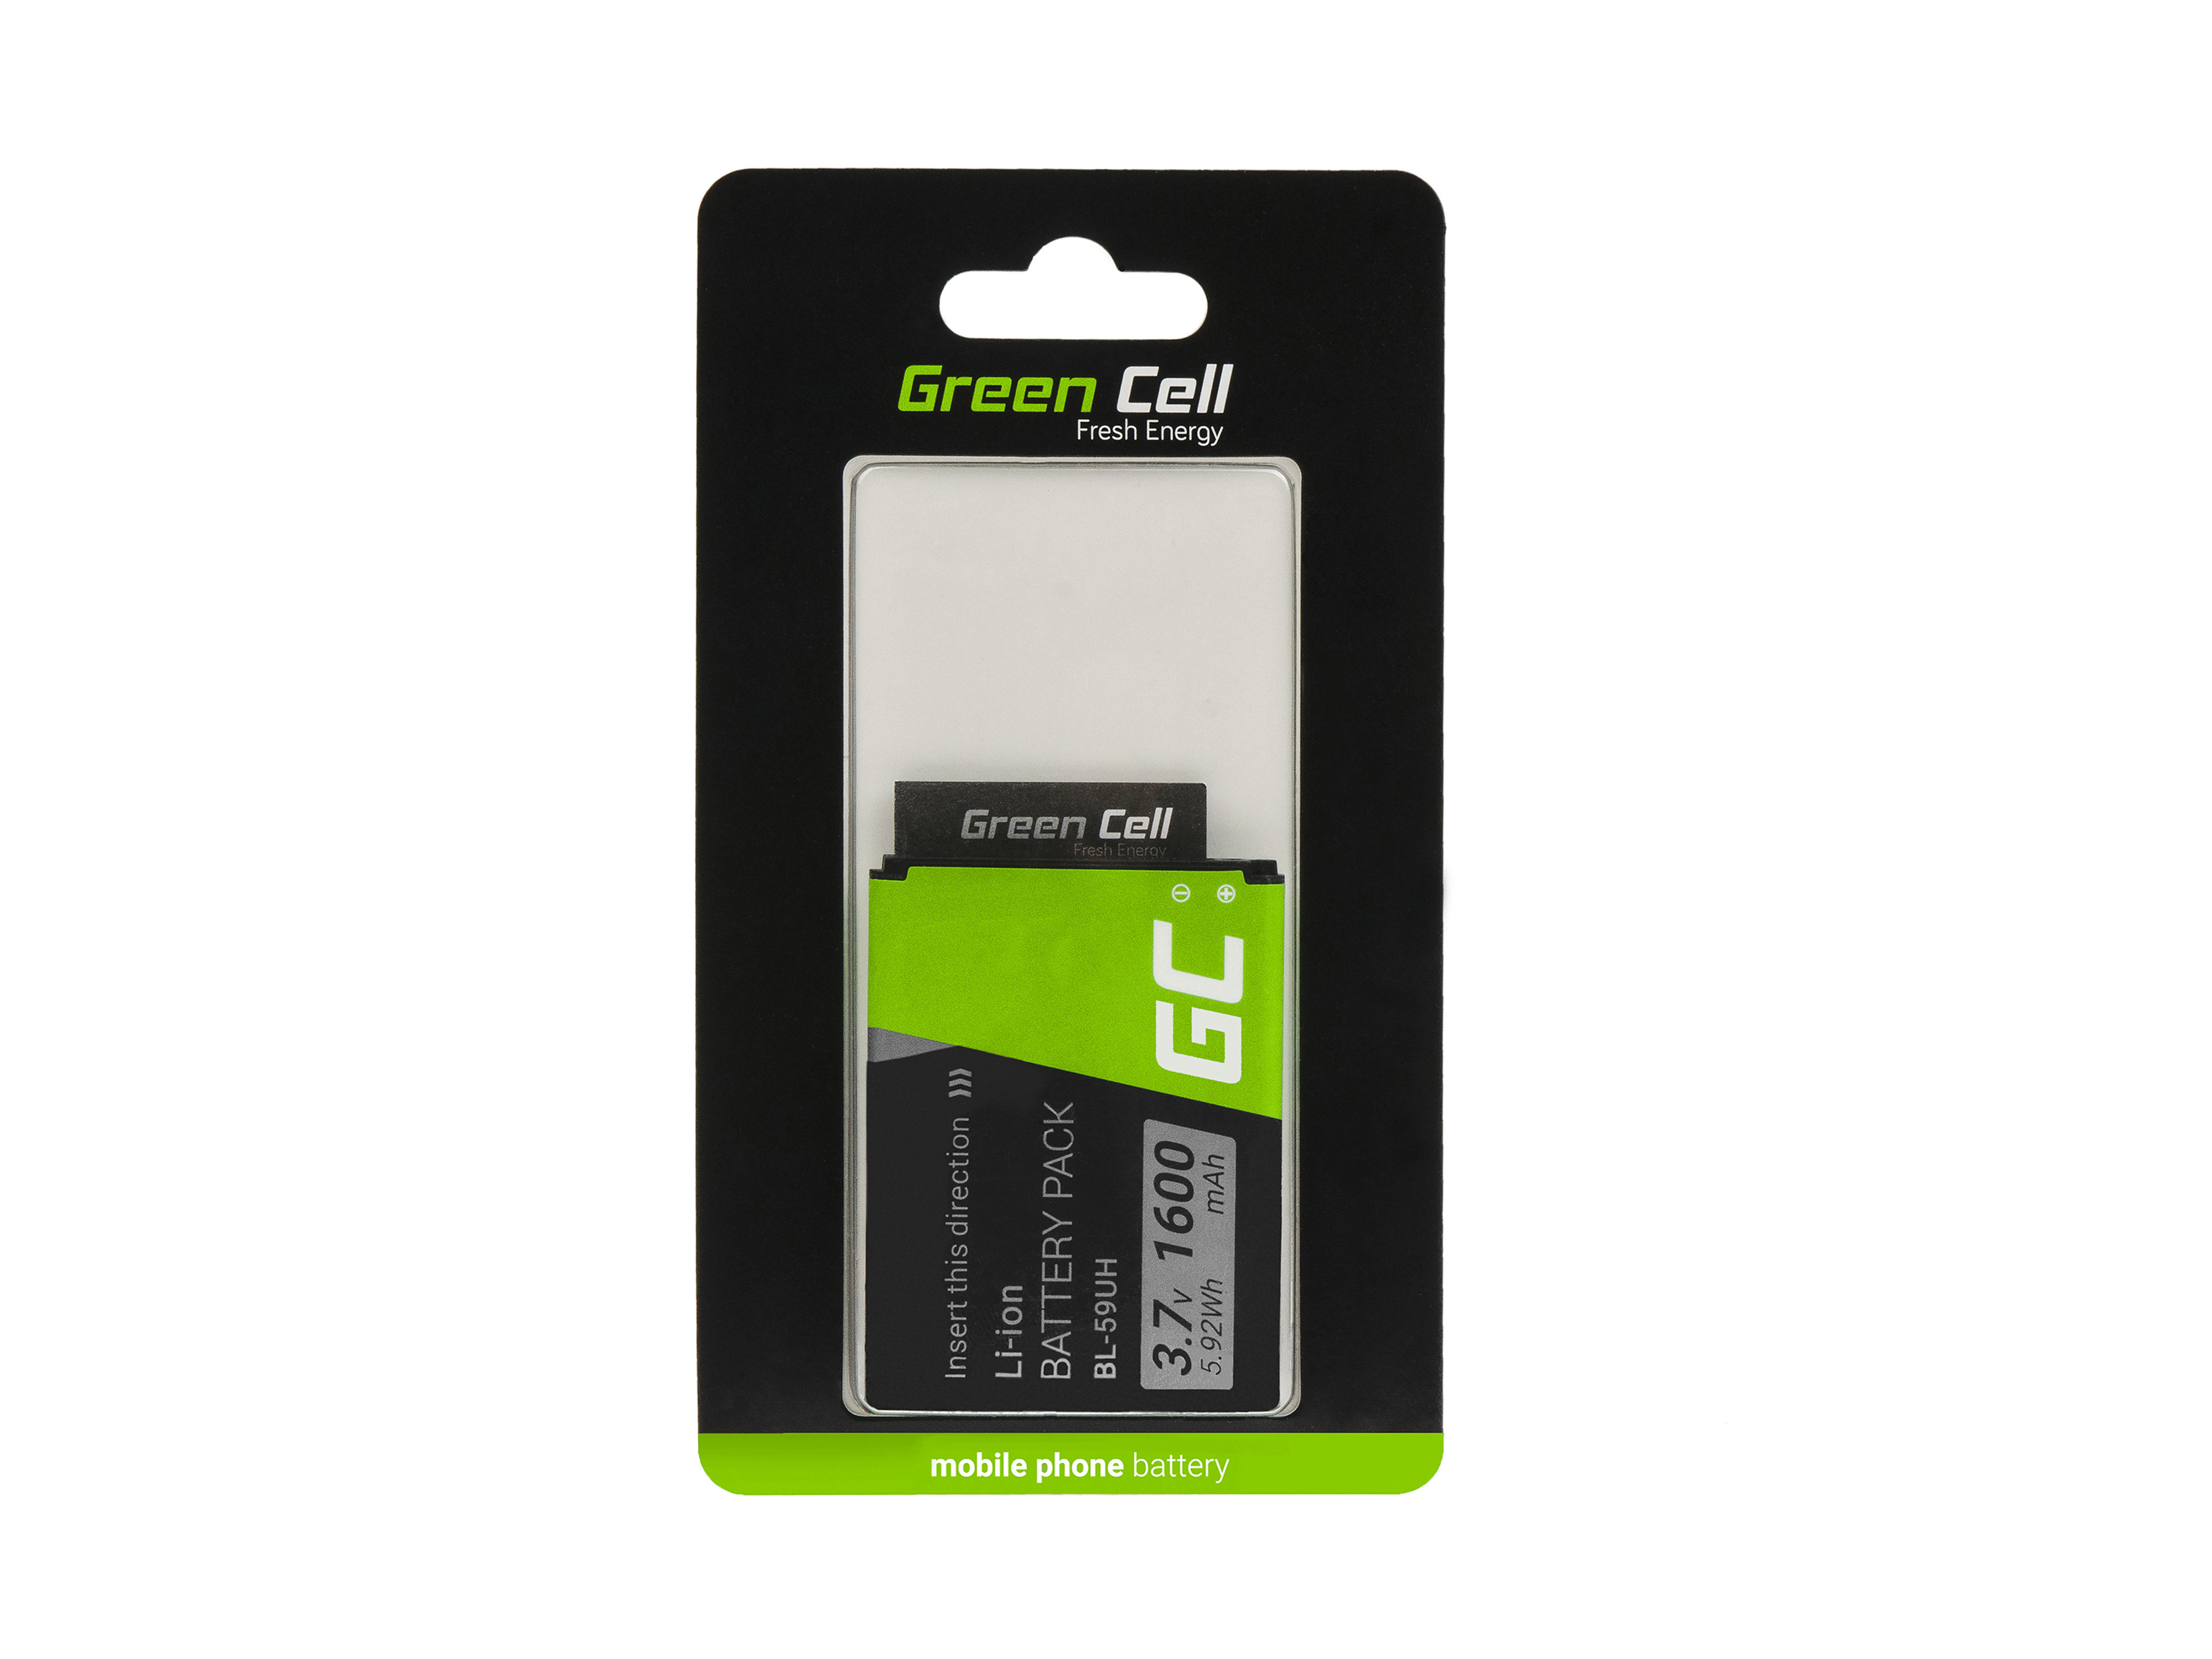 Baterie Green Cell LG BL-59UH pro LG G2 Mini 1600mAh Li-ion - neoriginální